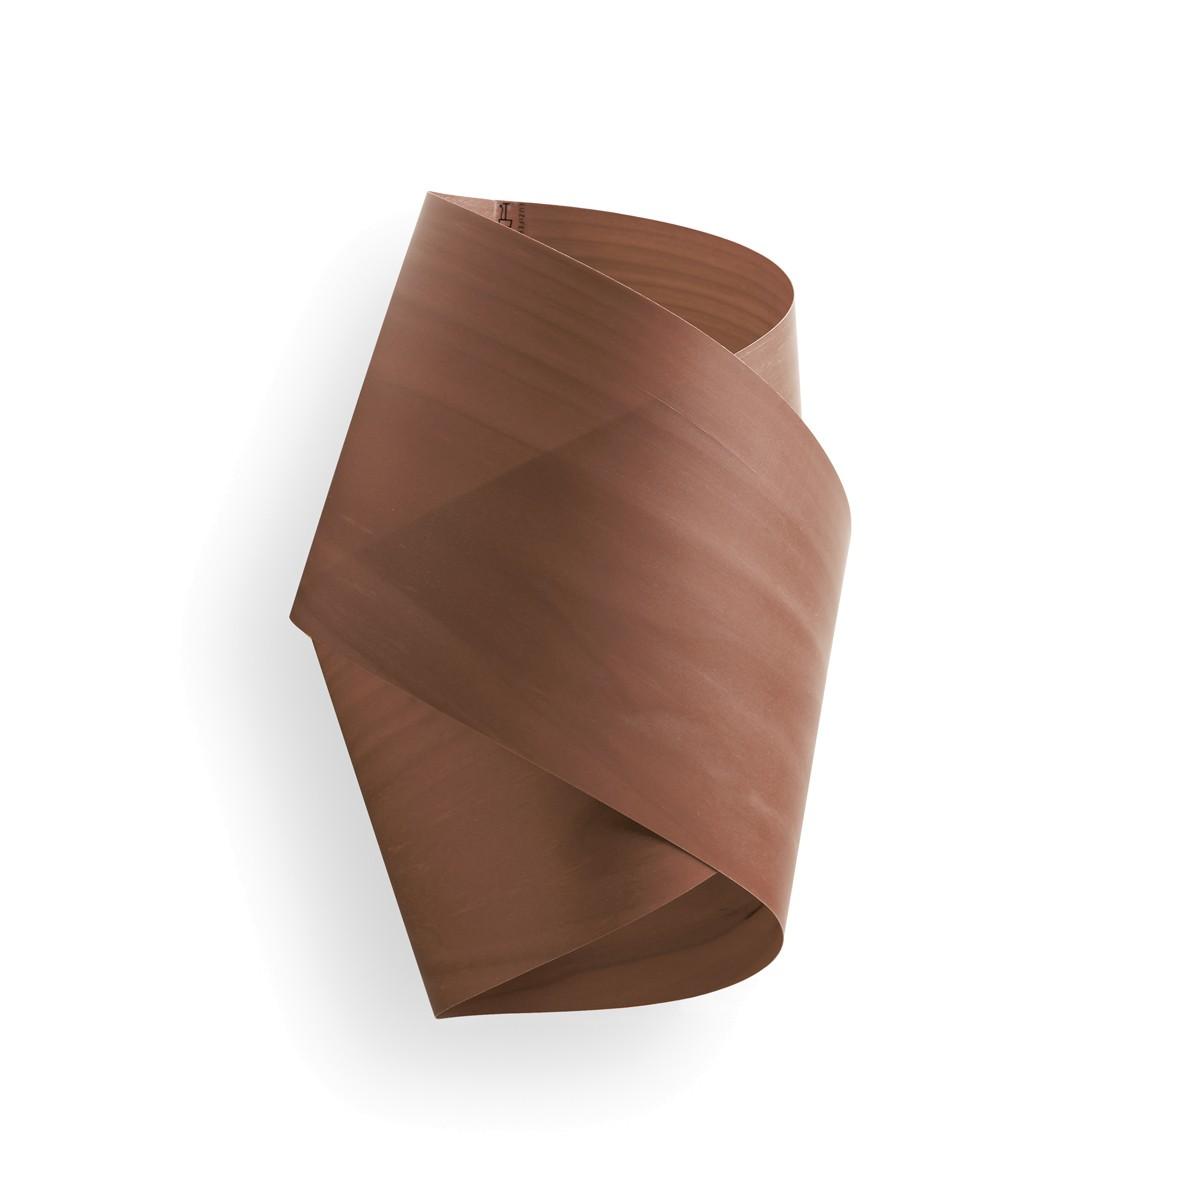 LZF Lamps Orbit Wandleuchte, schokolade